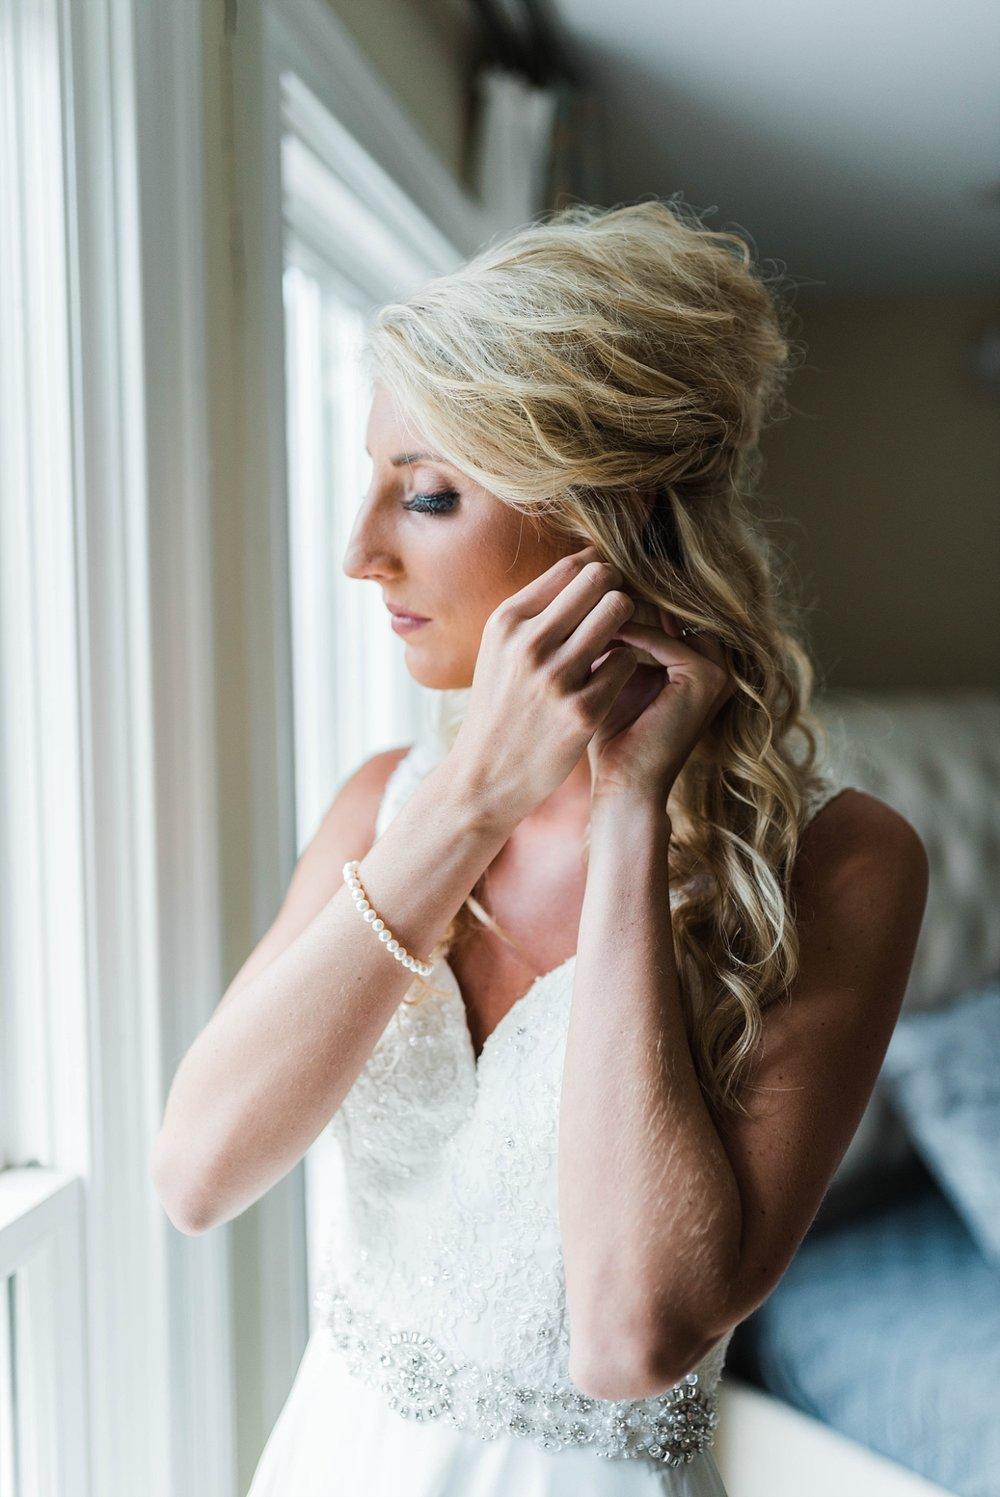 BRIDE GETTING READY | ELEGANT SPRING WEDDING AT THE SONNET HOUSE | TJ & SHELBY | JOHNSON WEDDING